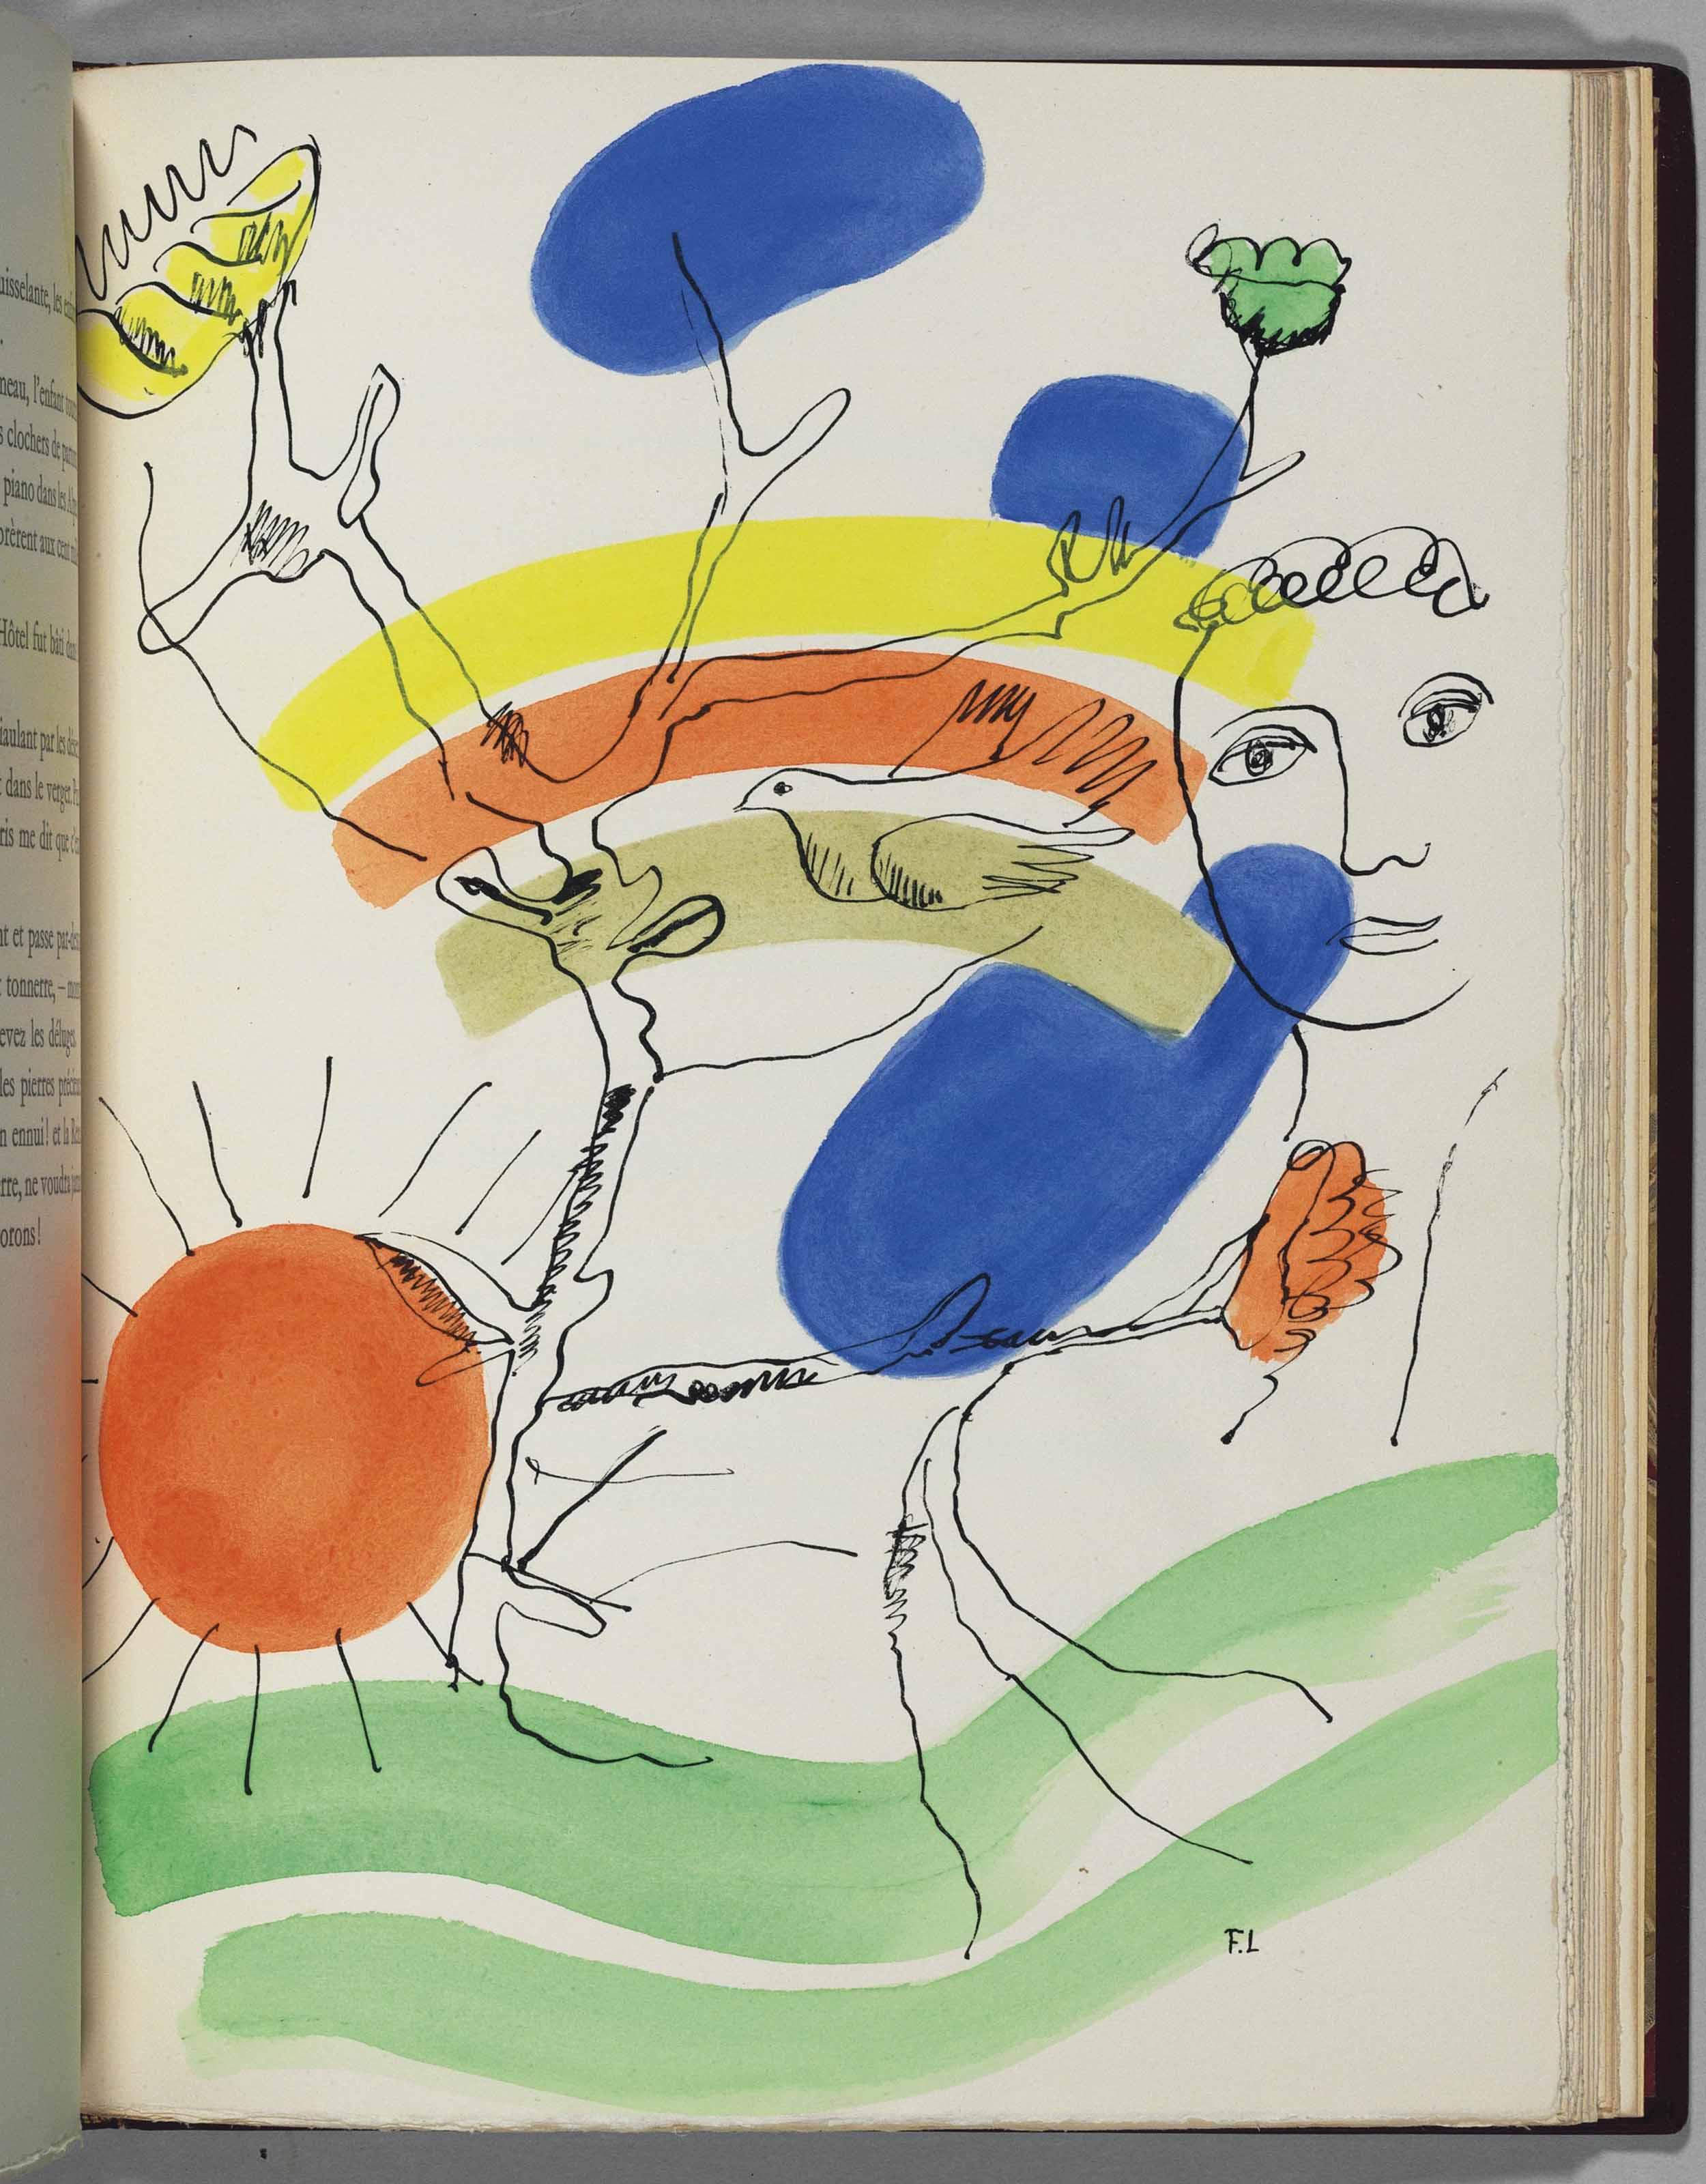 LÉGER, Fernand, illustrator (1881-1955). – RIMBAUD, Arthur (1854-1891). Les Illuminations. Lausanne: Grosclaude, [1949].